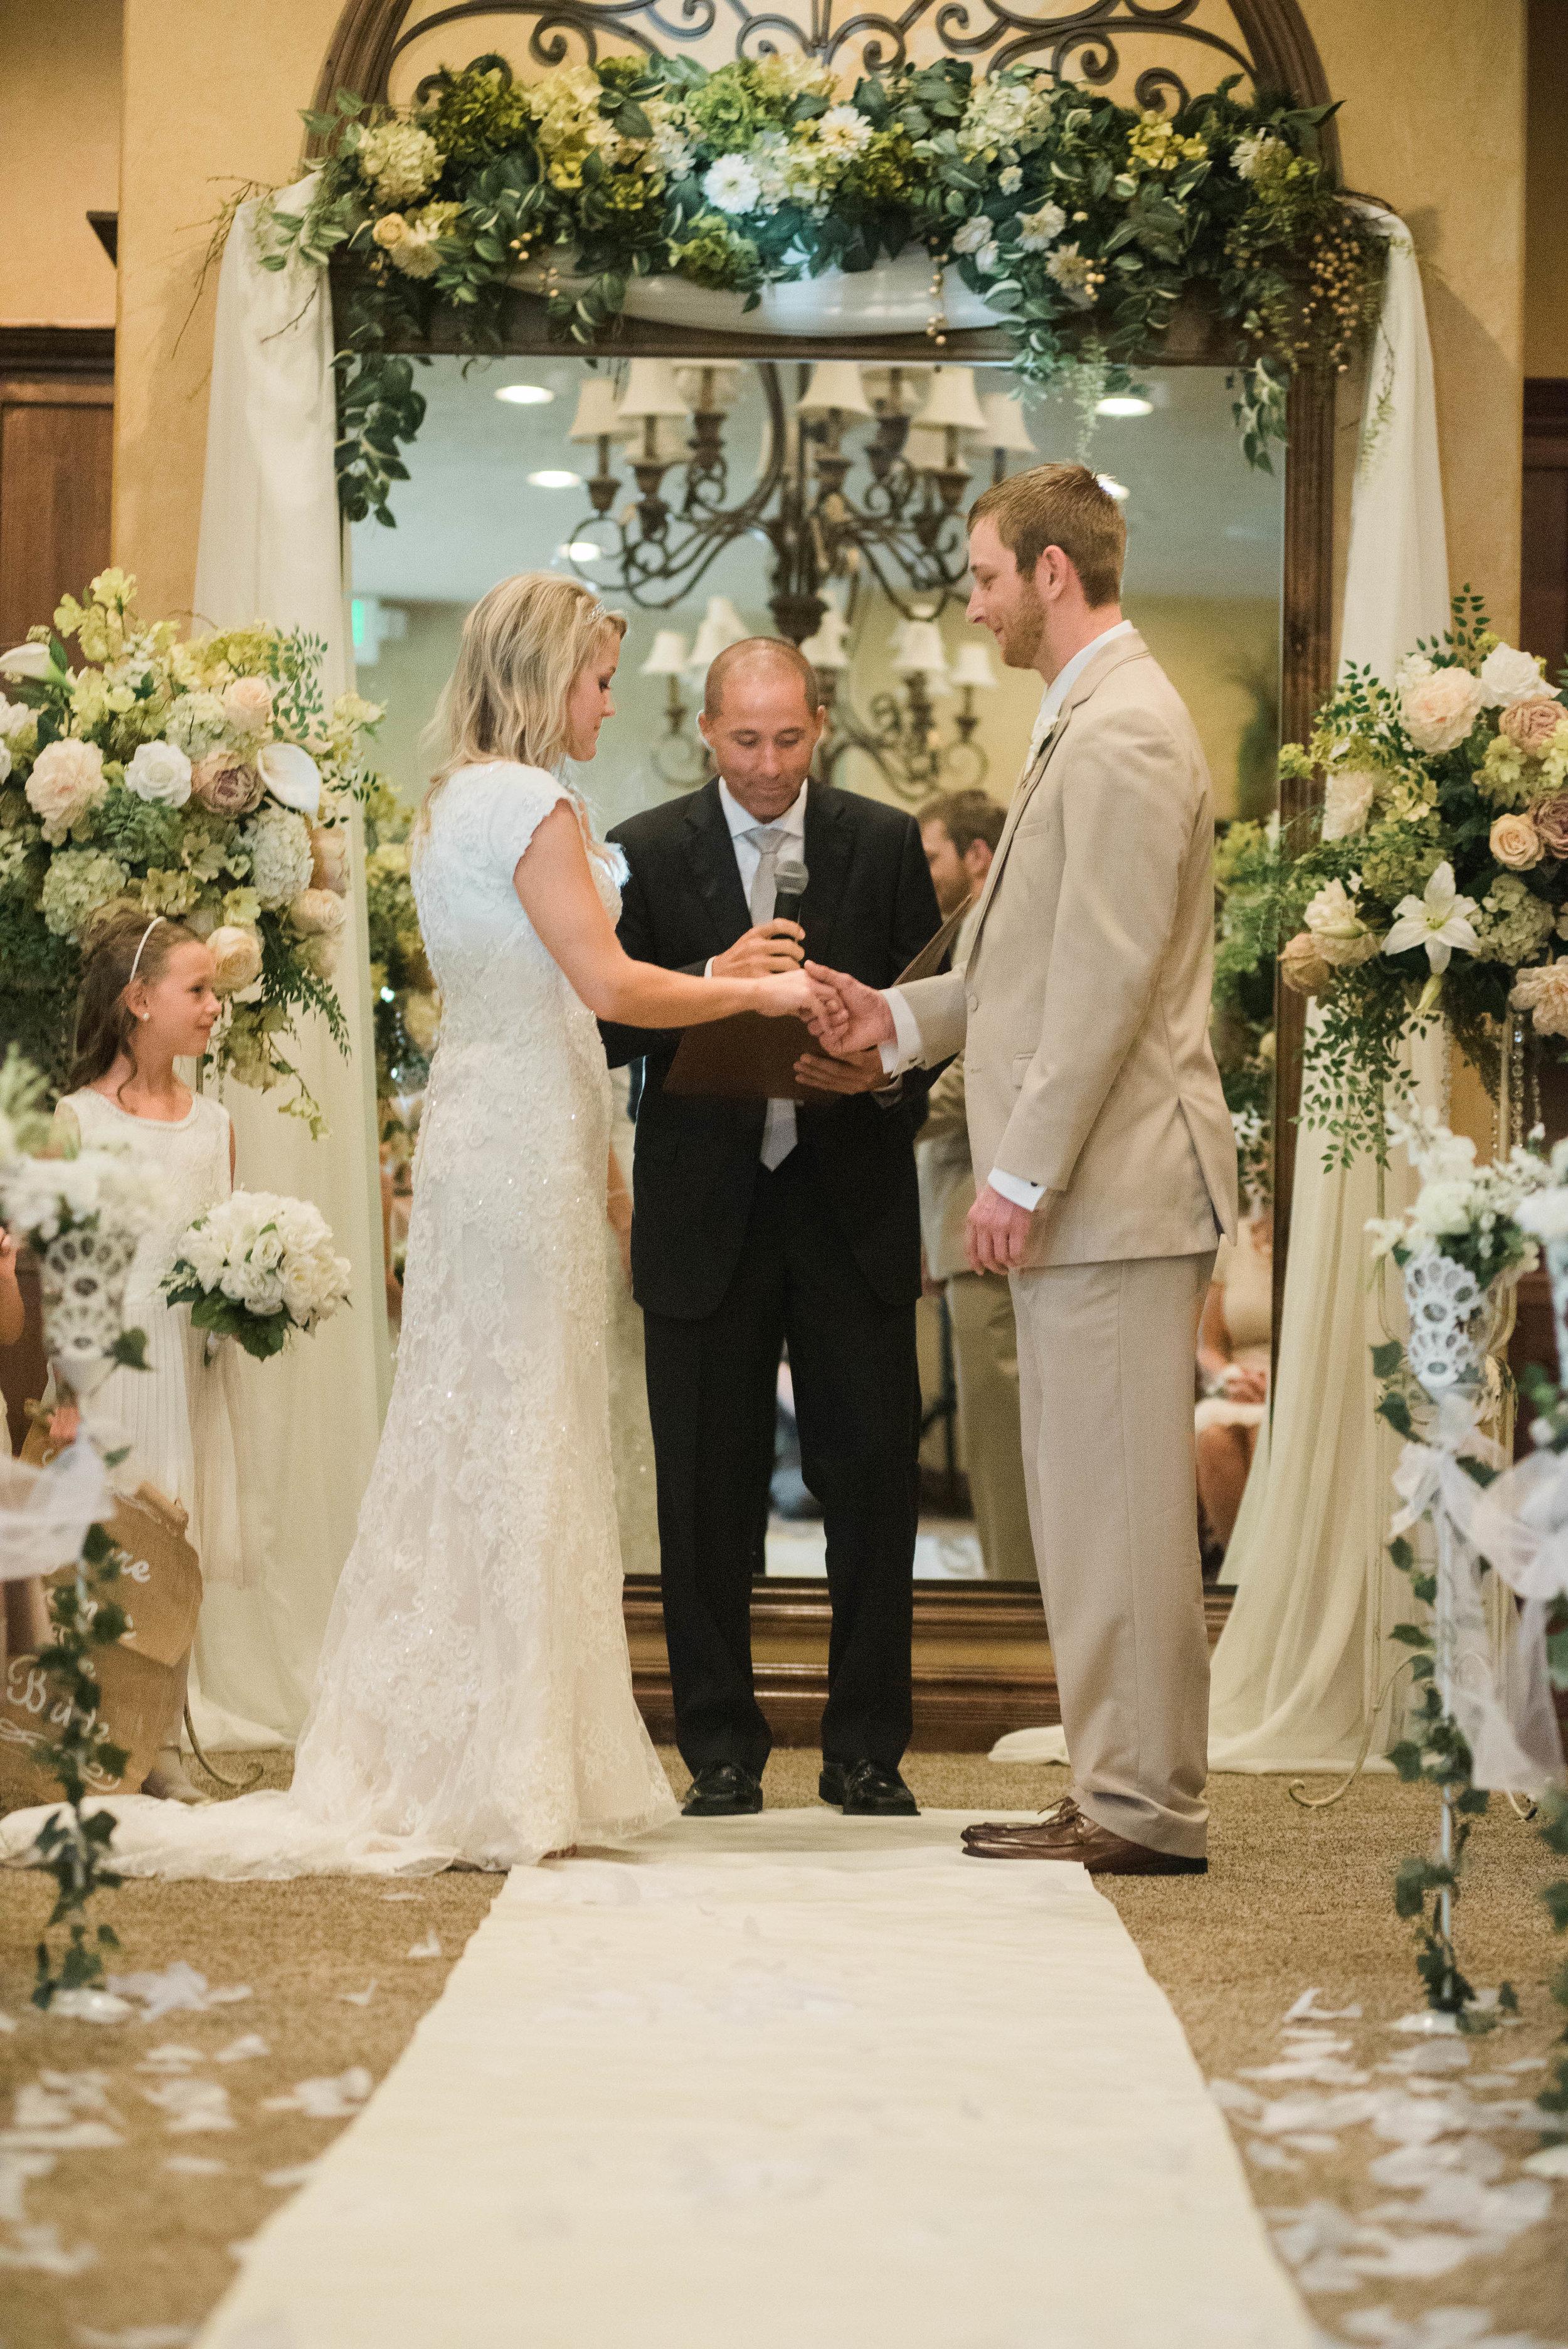 DANIEL+LACI-WEDDING-Sadie_Banks_Photography-185.jpg